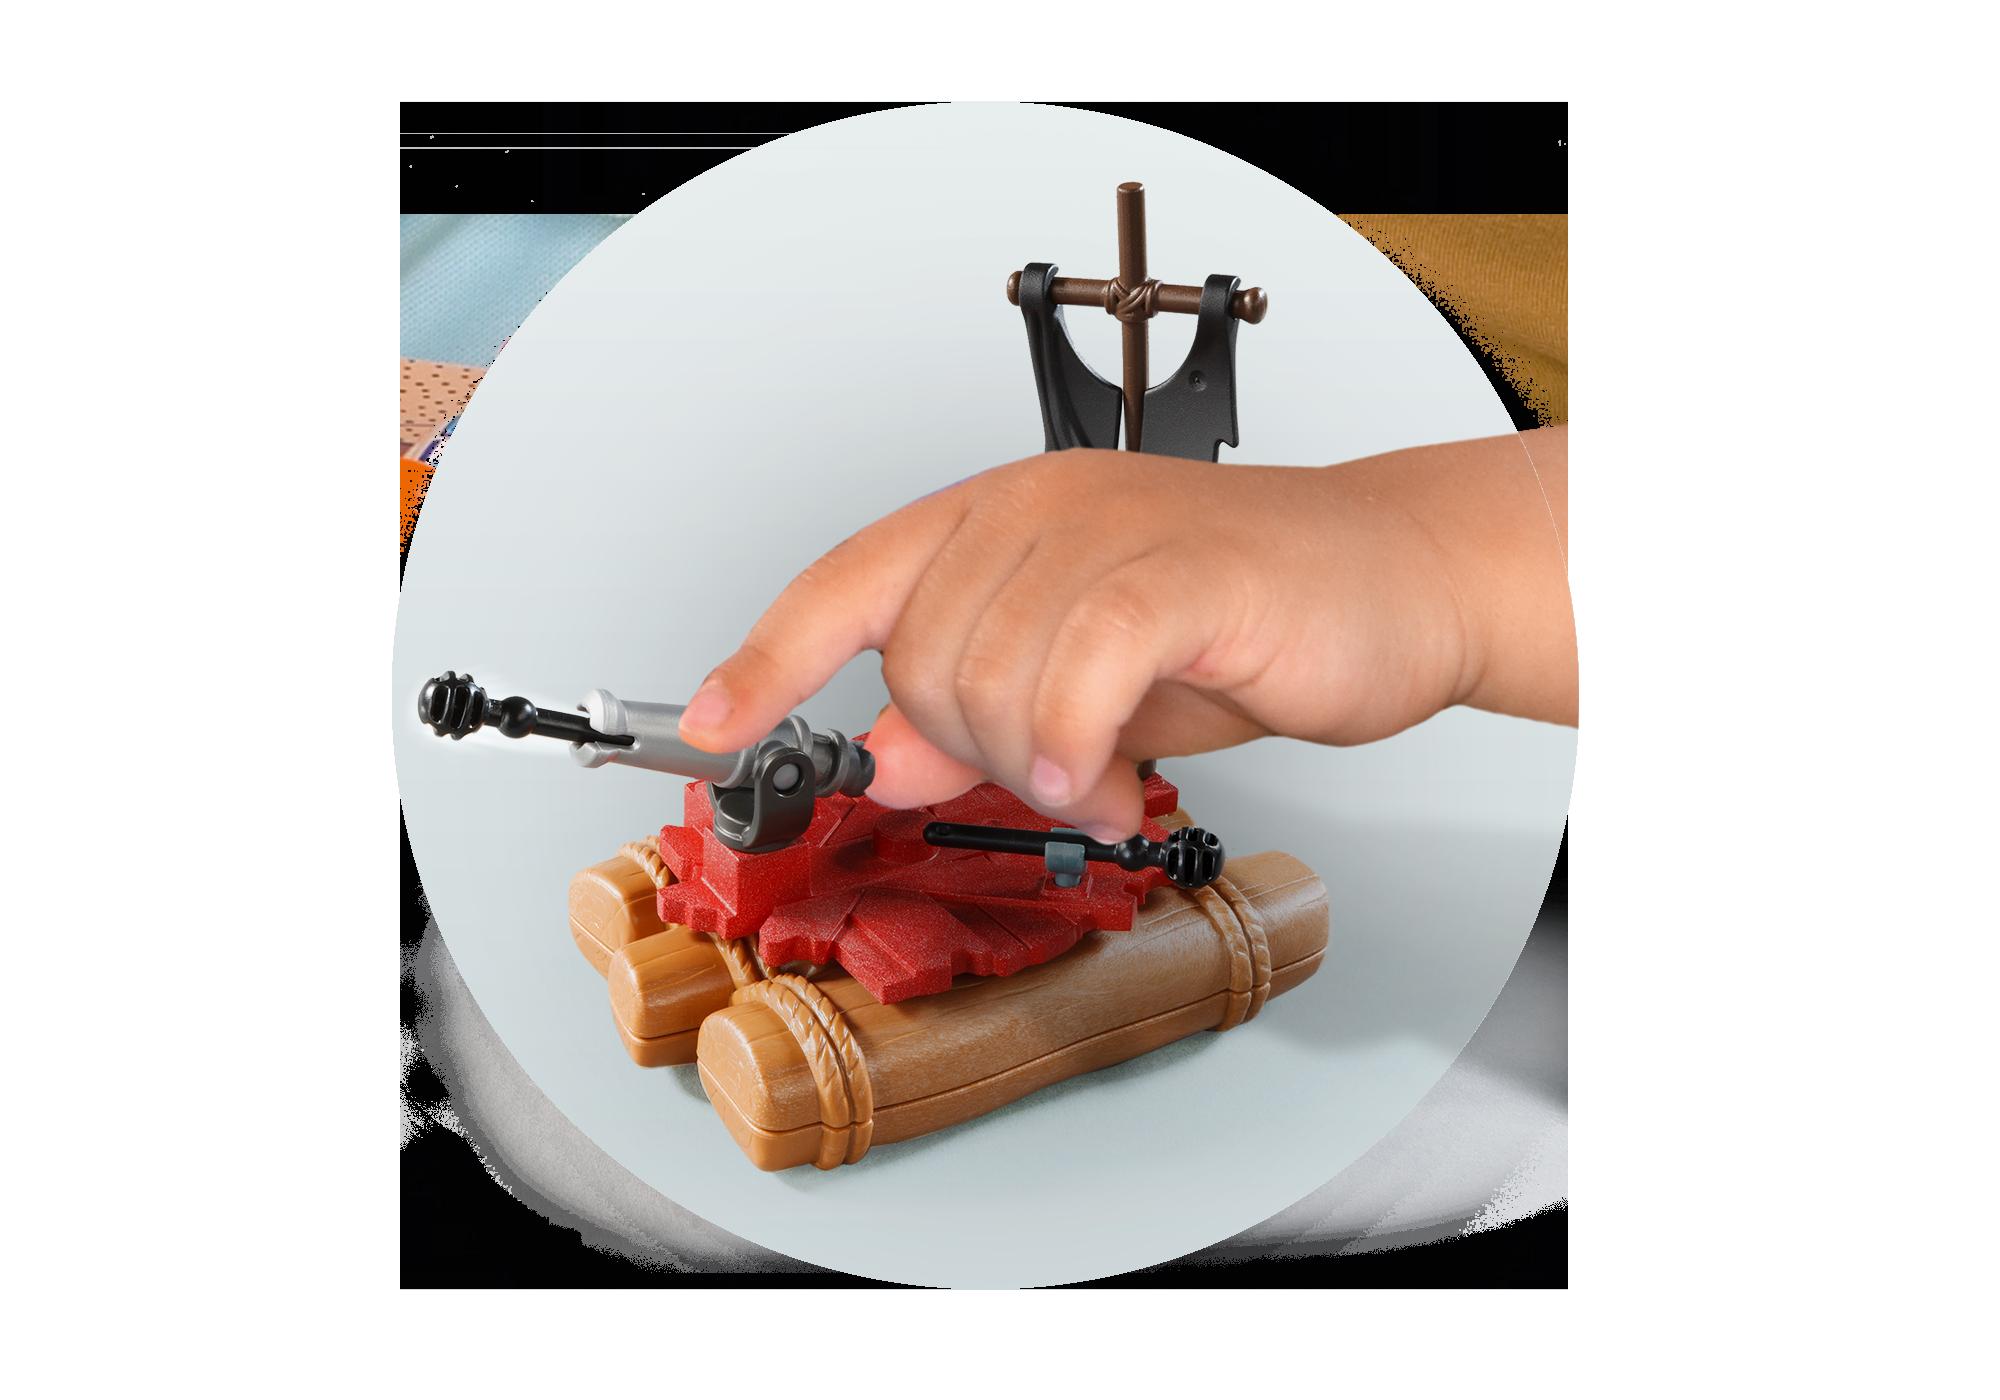 http://media.playmobil.com/i/playmobil/5655_product_extra2/Βαλιτσάκι Πειρατής με σχεδία